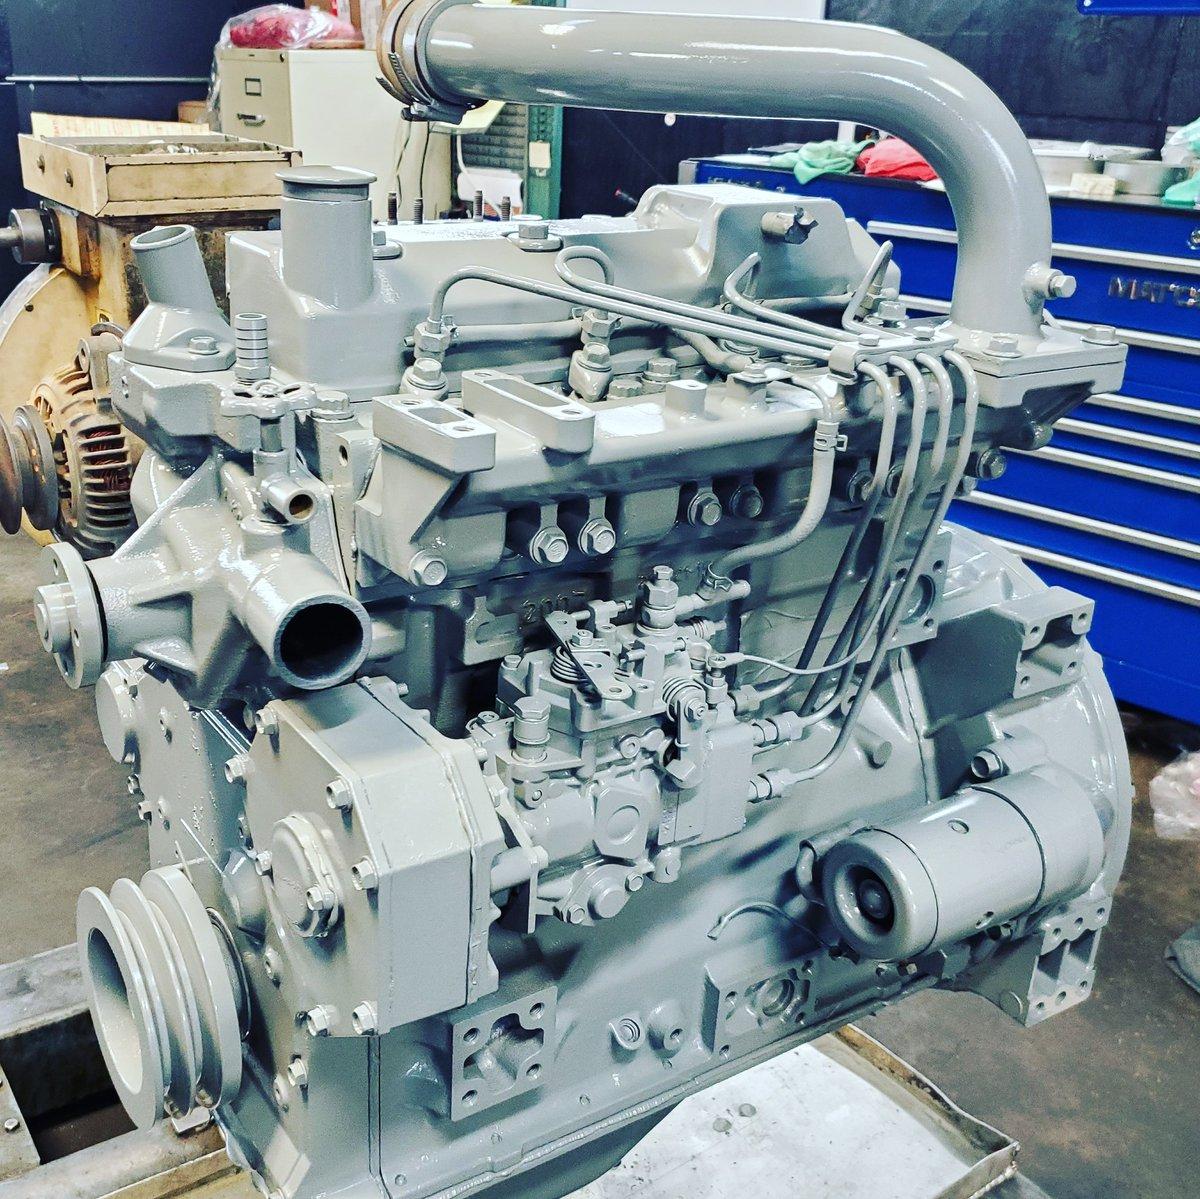 Grey looks good on our little Cummins engine  #diesel #engines #diesellife #AFS #atlanta #atlantadiesel #cummins #cumminsdealer #dieselenginespic.twitter.com/wnxLUPlRtY